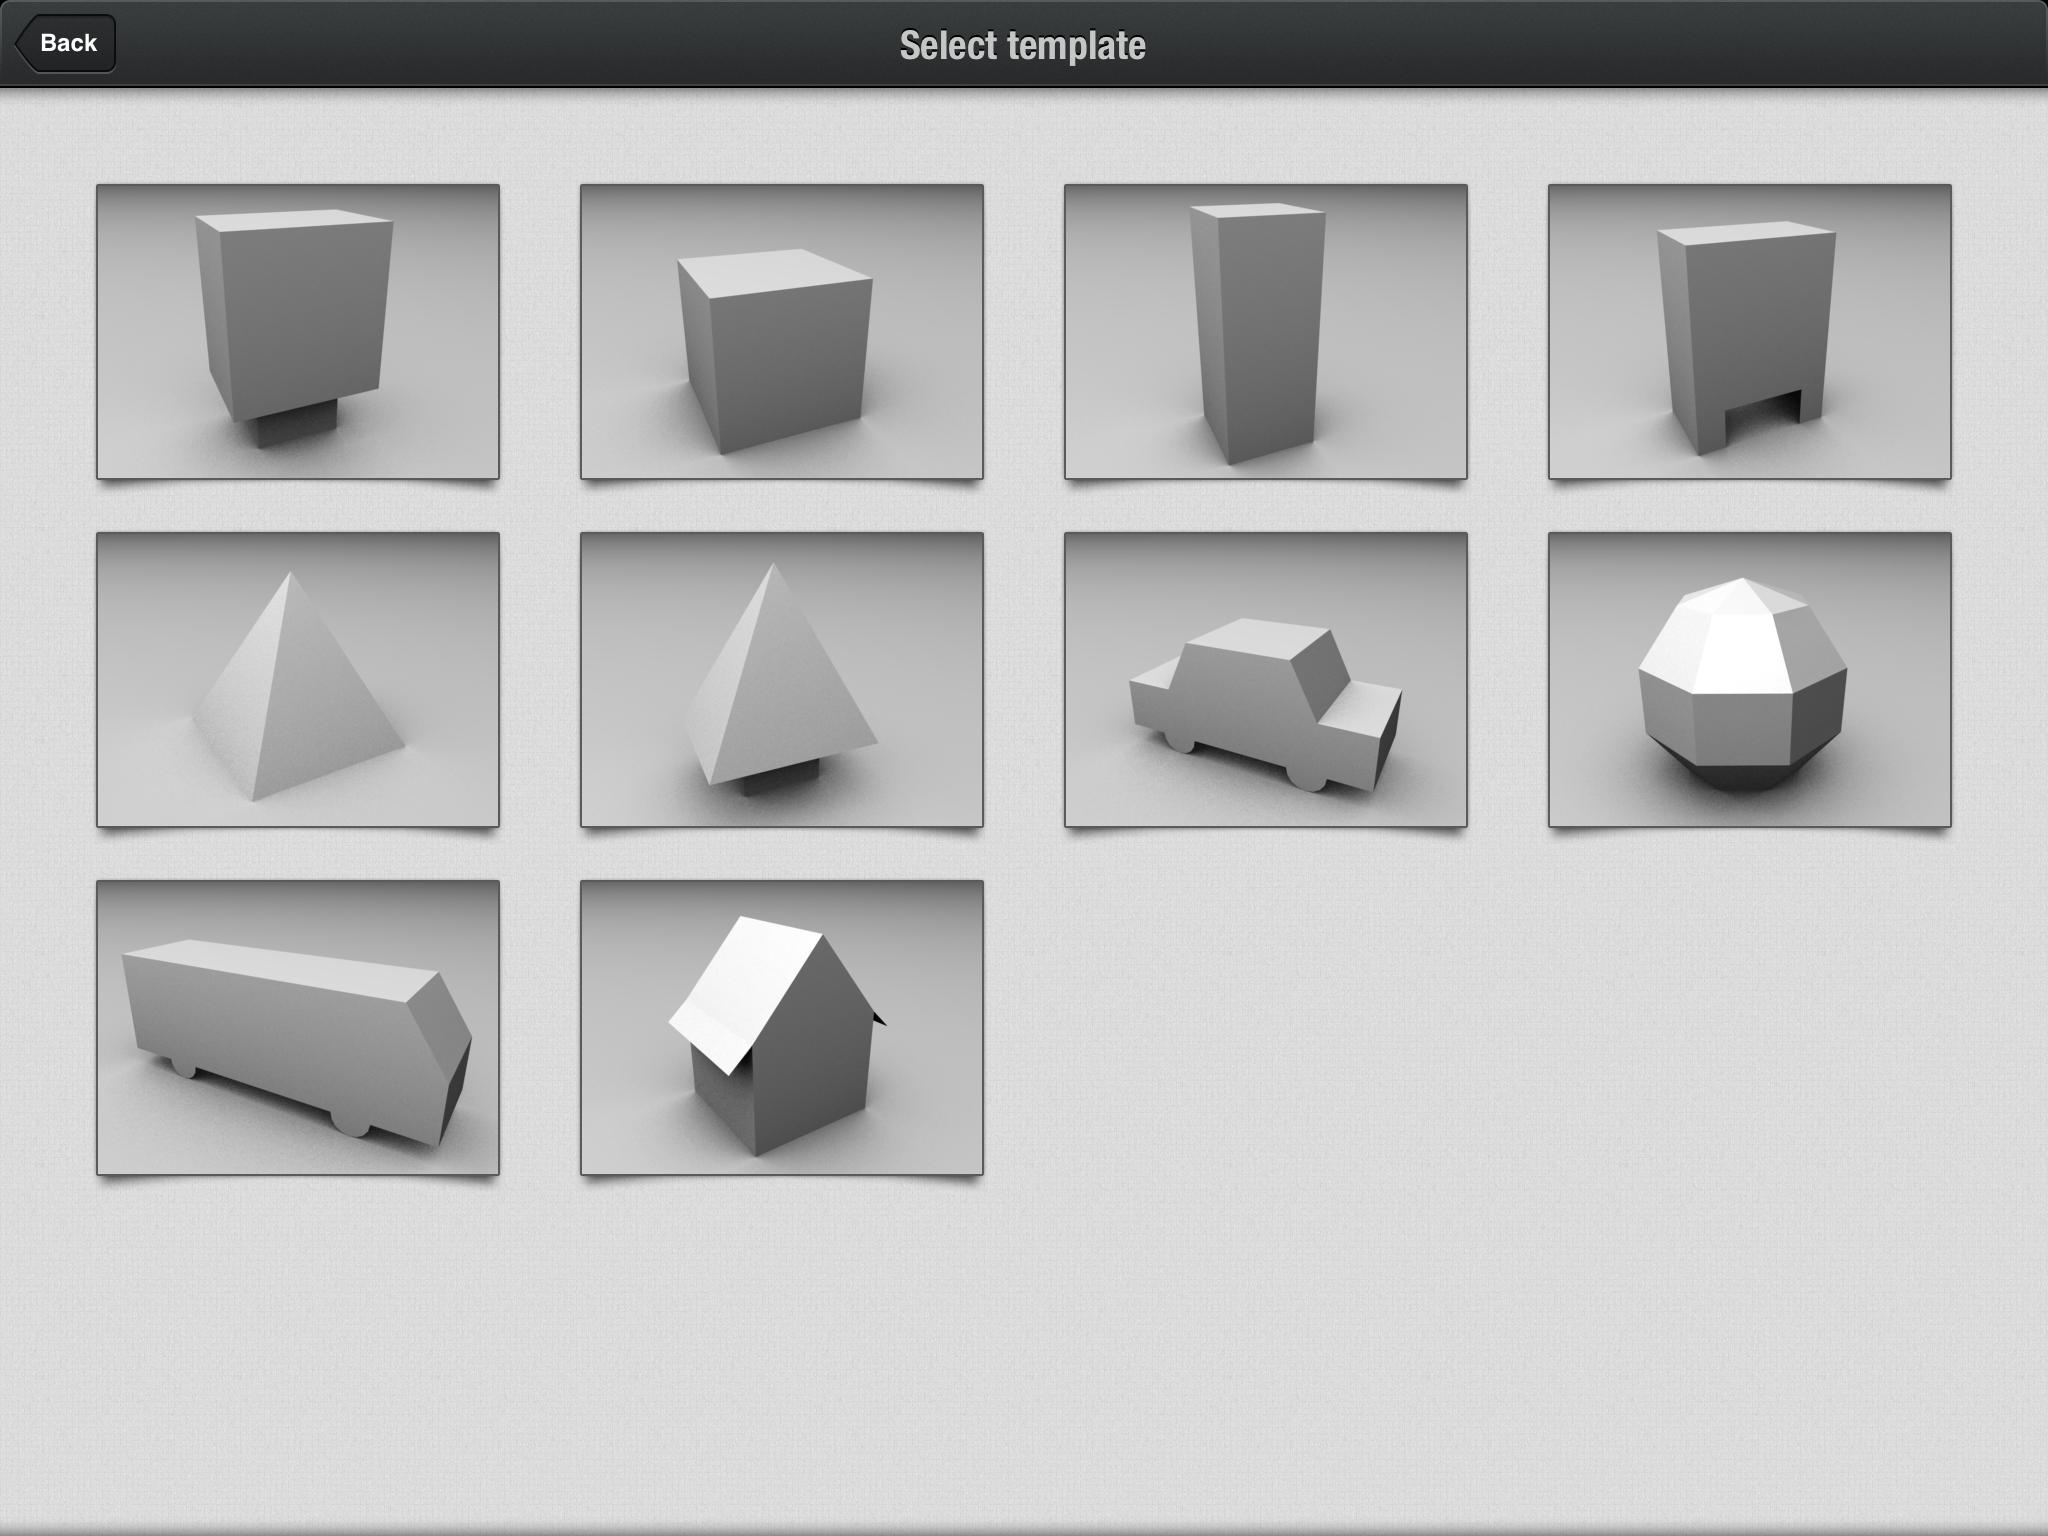 Foldify App - Templates